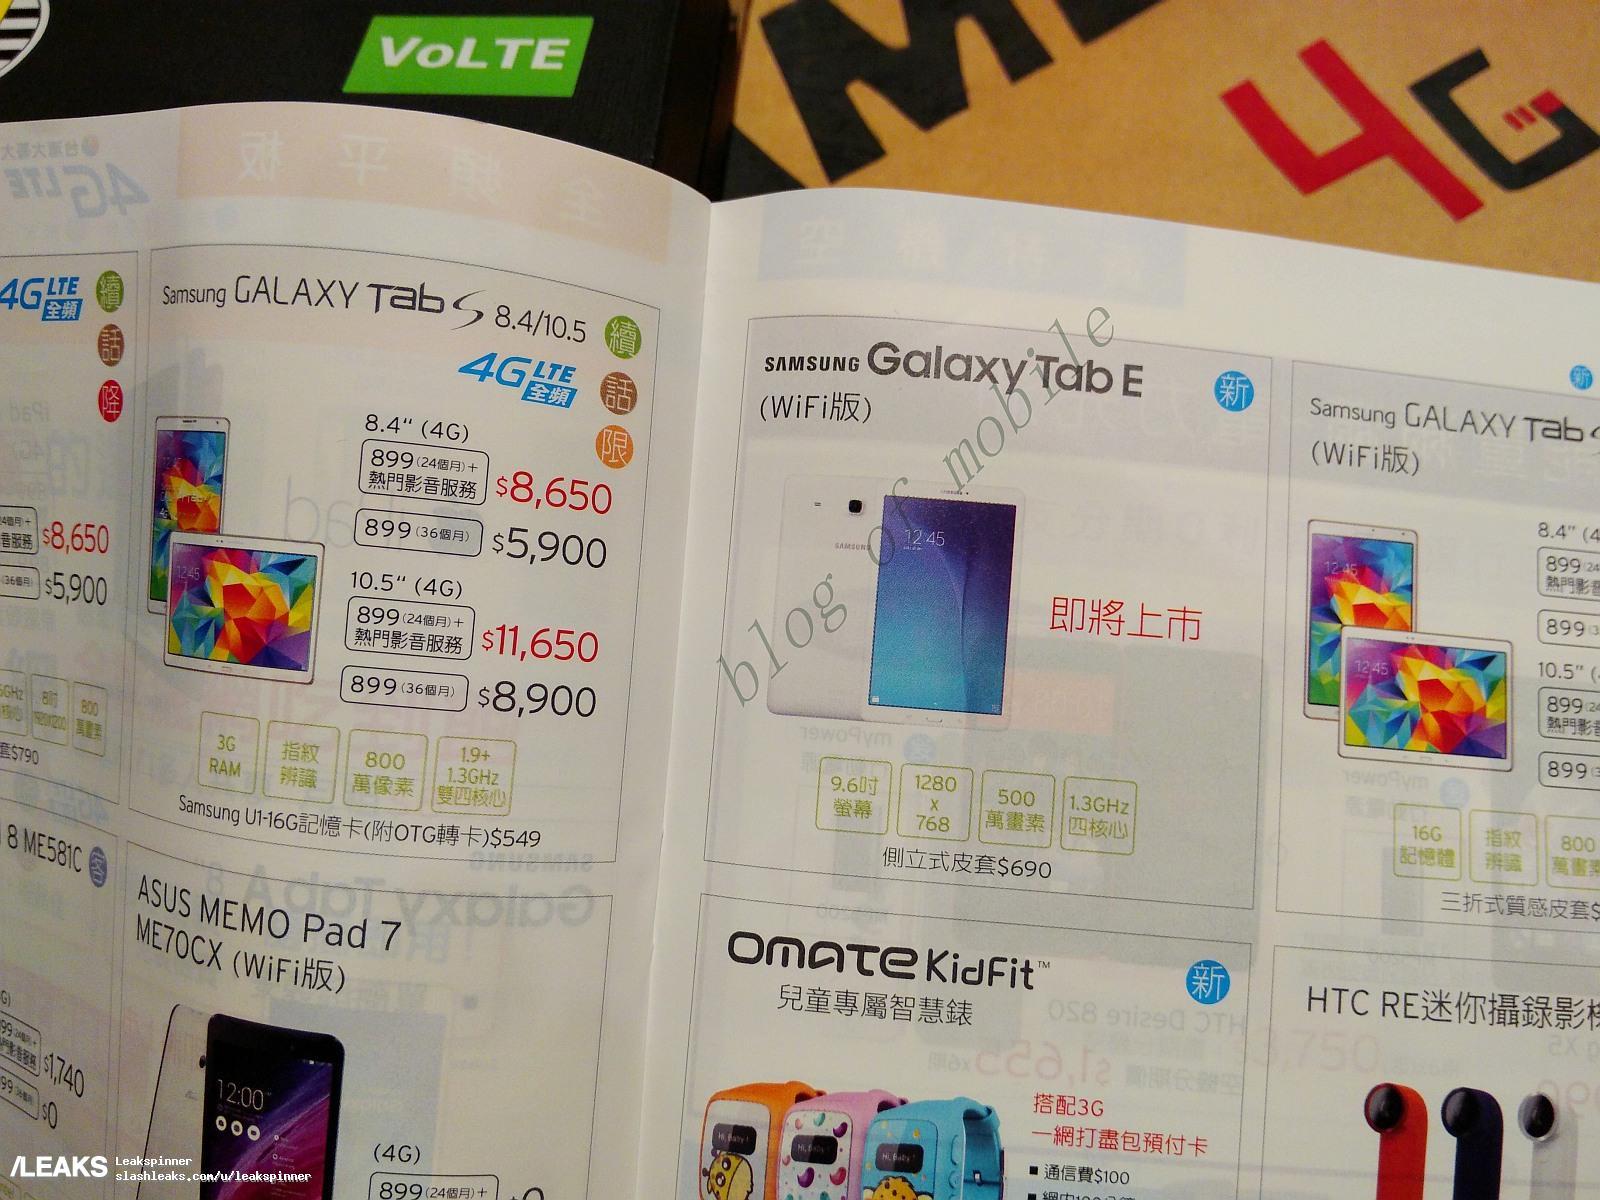 img Unannounced Samsung Galaxy Tab E spotted in taiwan